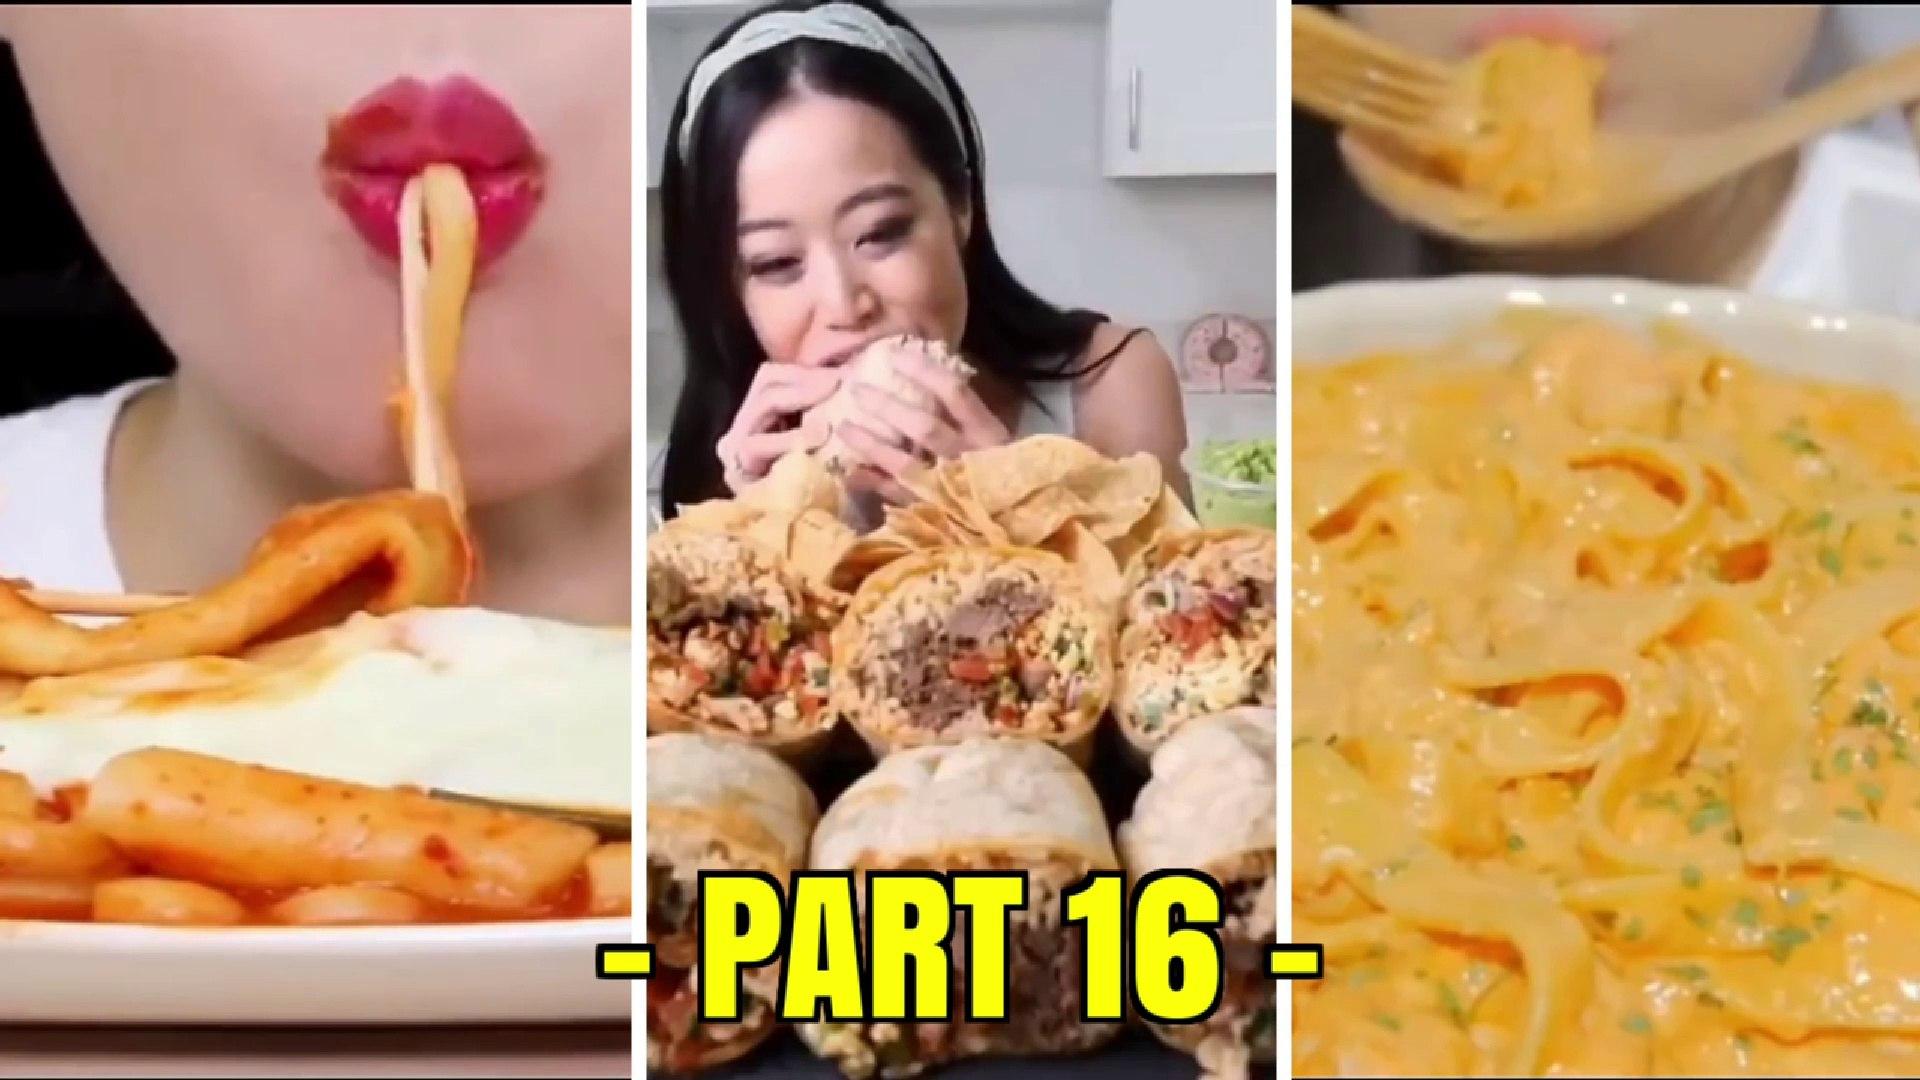 PART 16 NEW | NEW MUKBANG ASMR EATSS.!! New Mukbang Compilations ASMR EATS Eating Show Foods PART 16